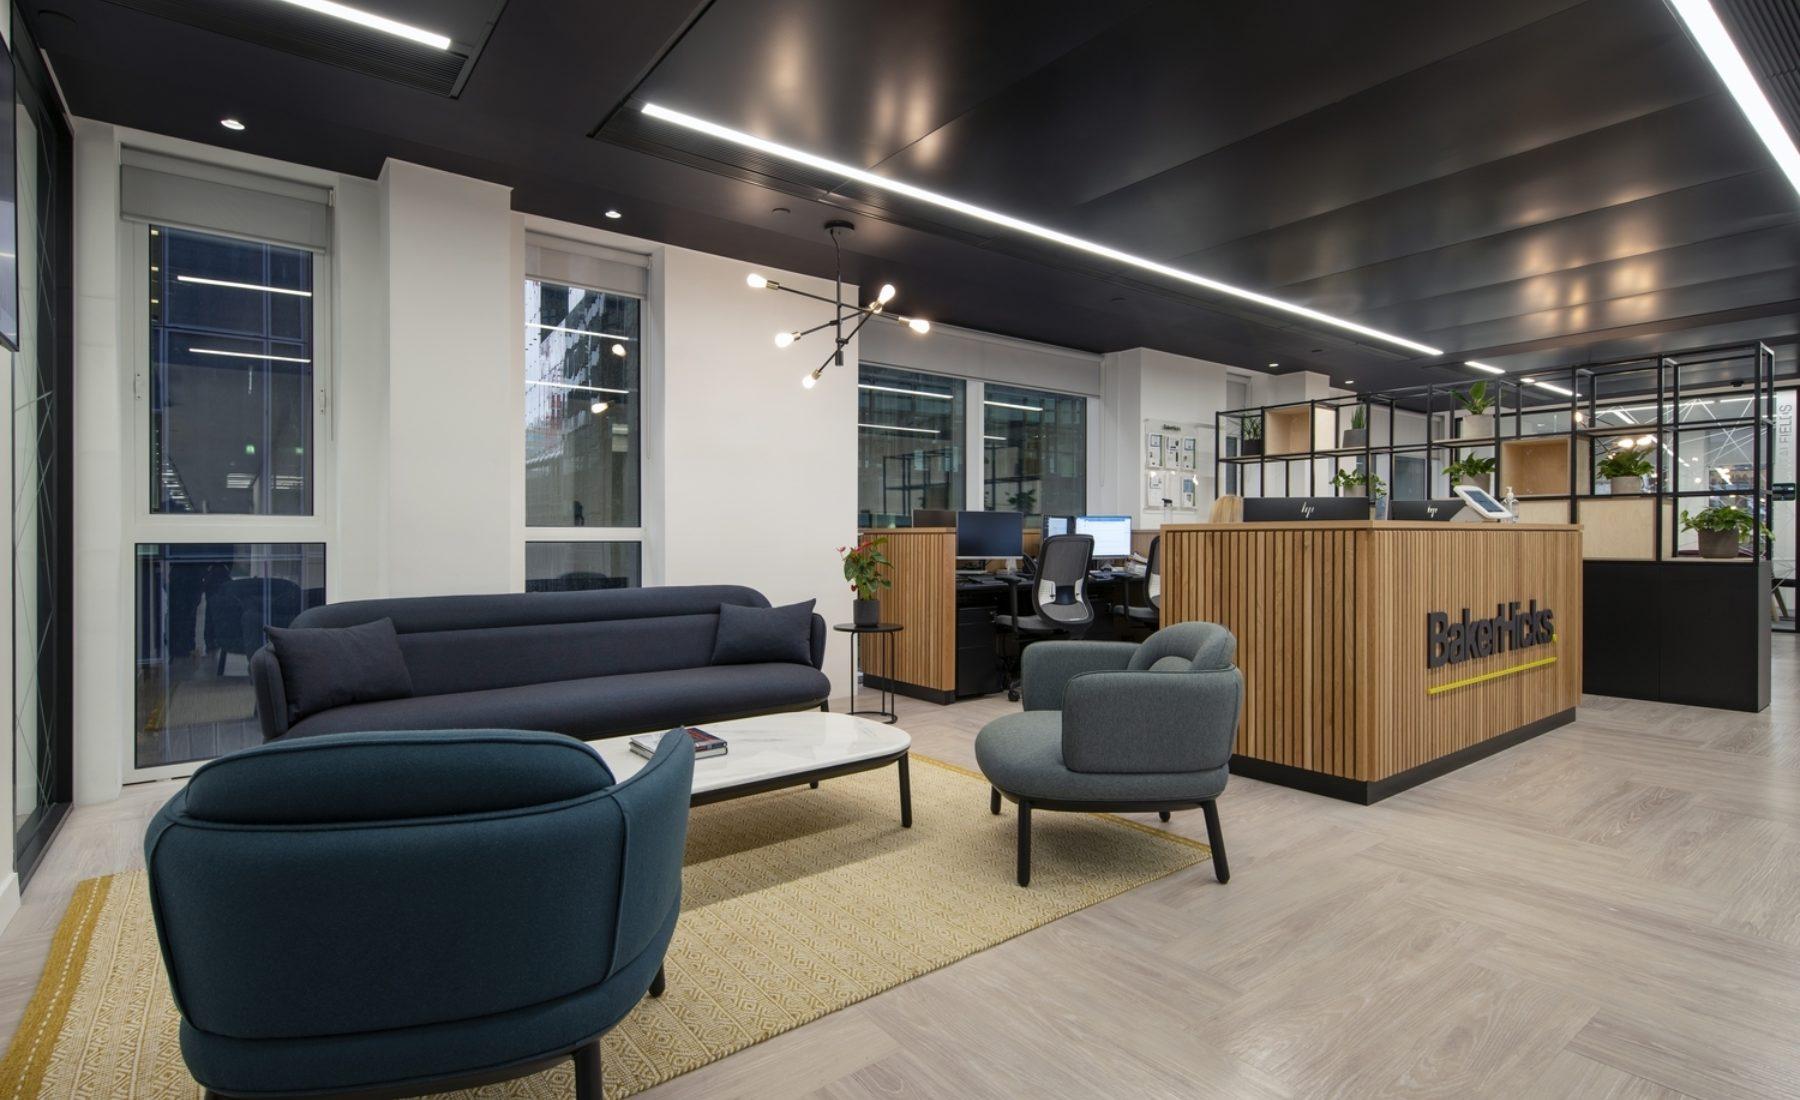 BakerHicks office design and build